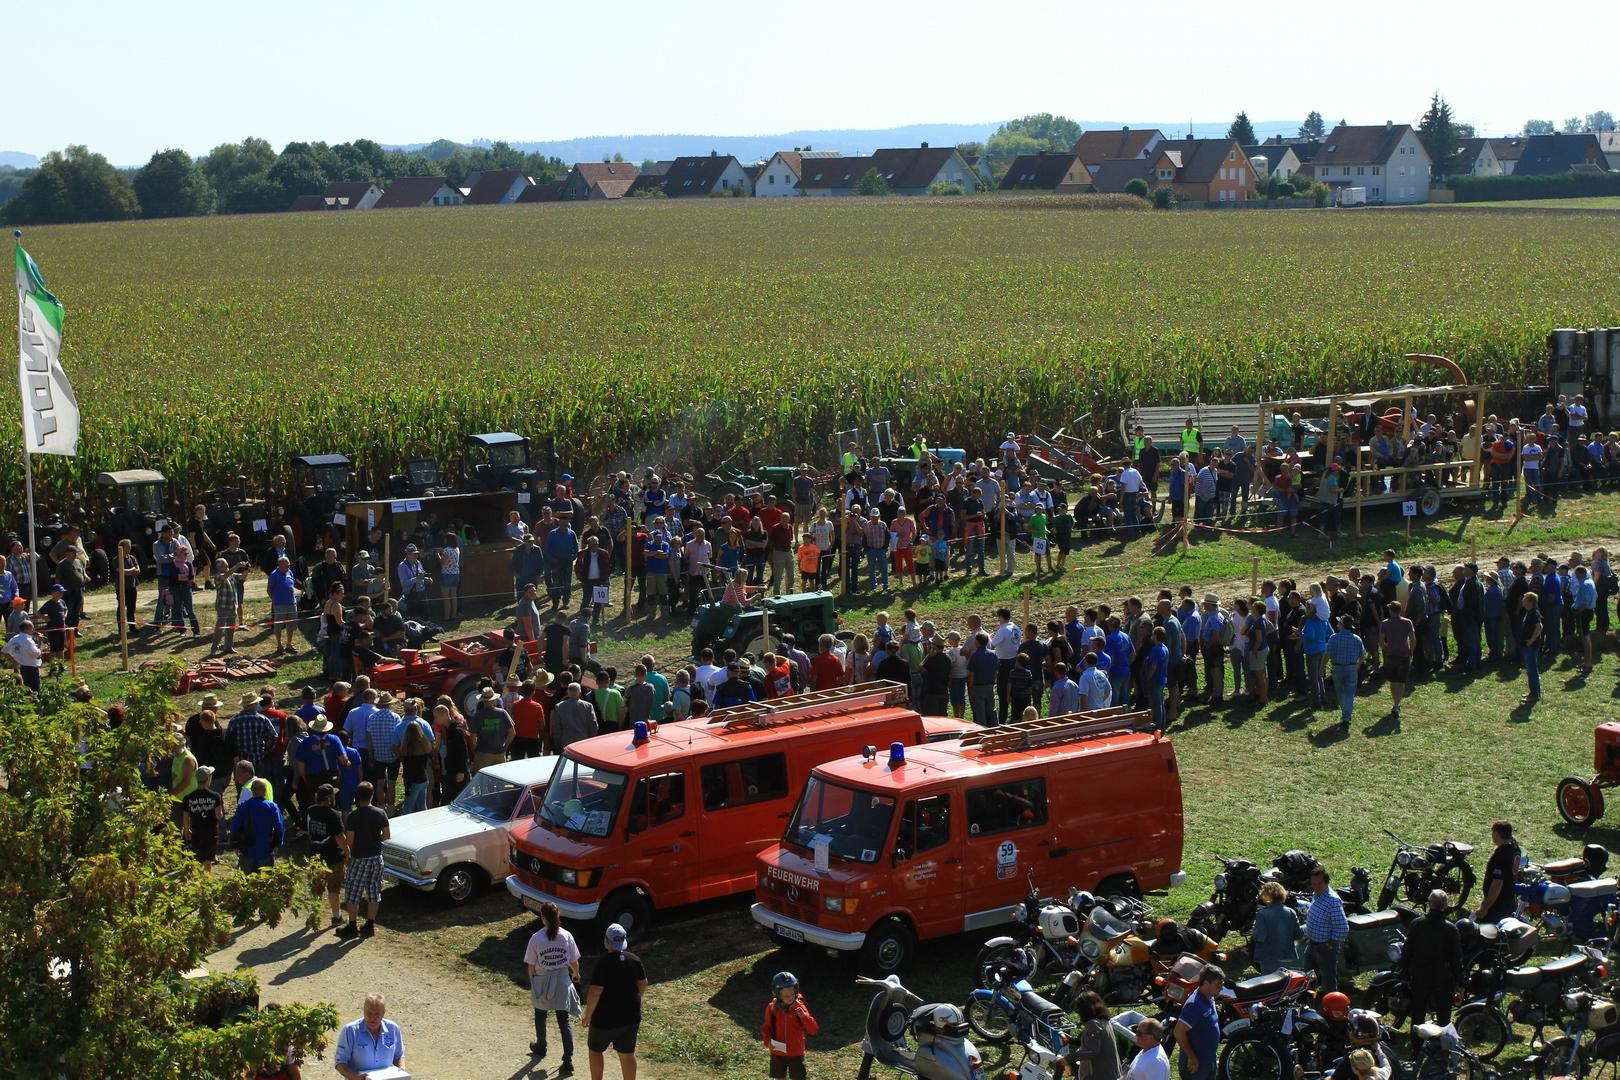 2018_09_14-16 Schleppertreffen Schmiechen  1060